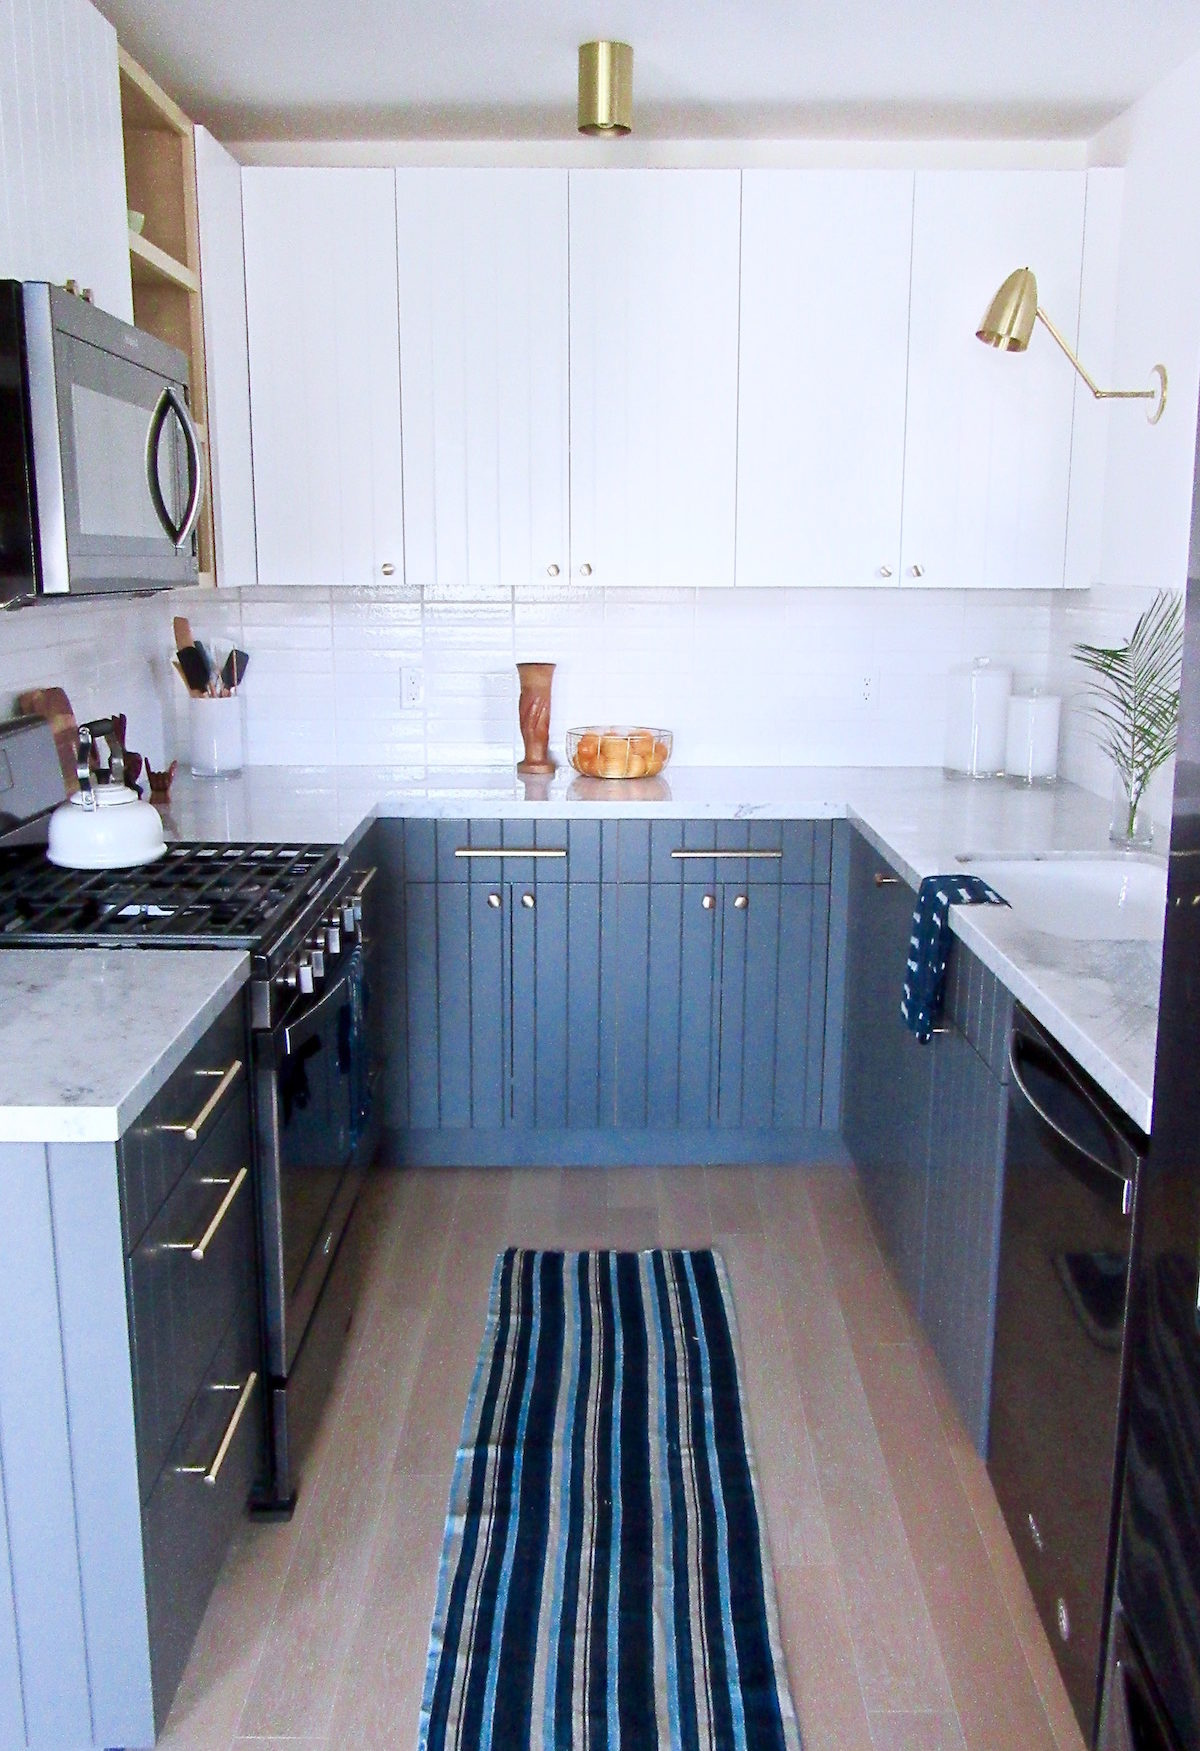 Silver Lake Small Kitchen Remodel - Black Appliance Trend ...